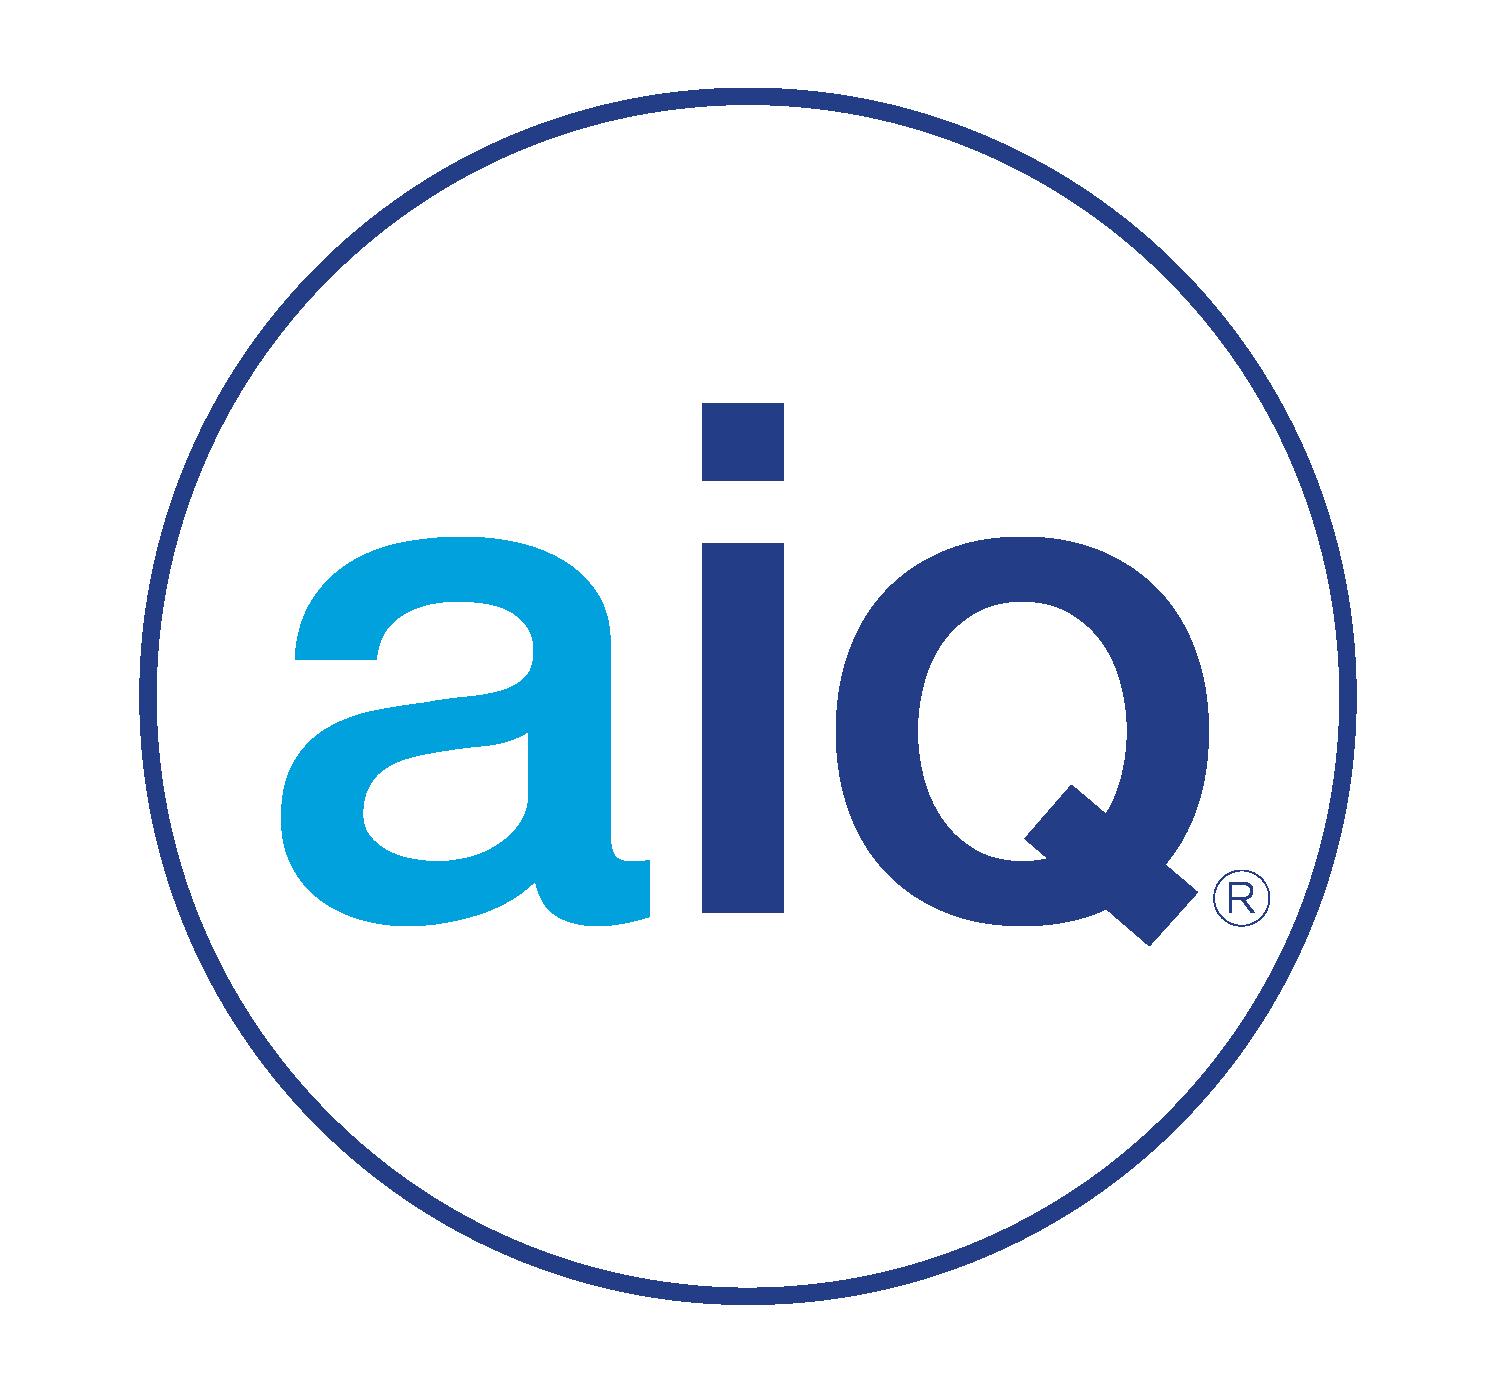 AIQ Final Logos_AIQ Main logo.png